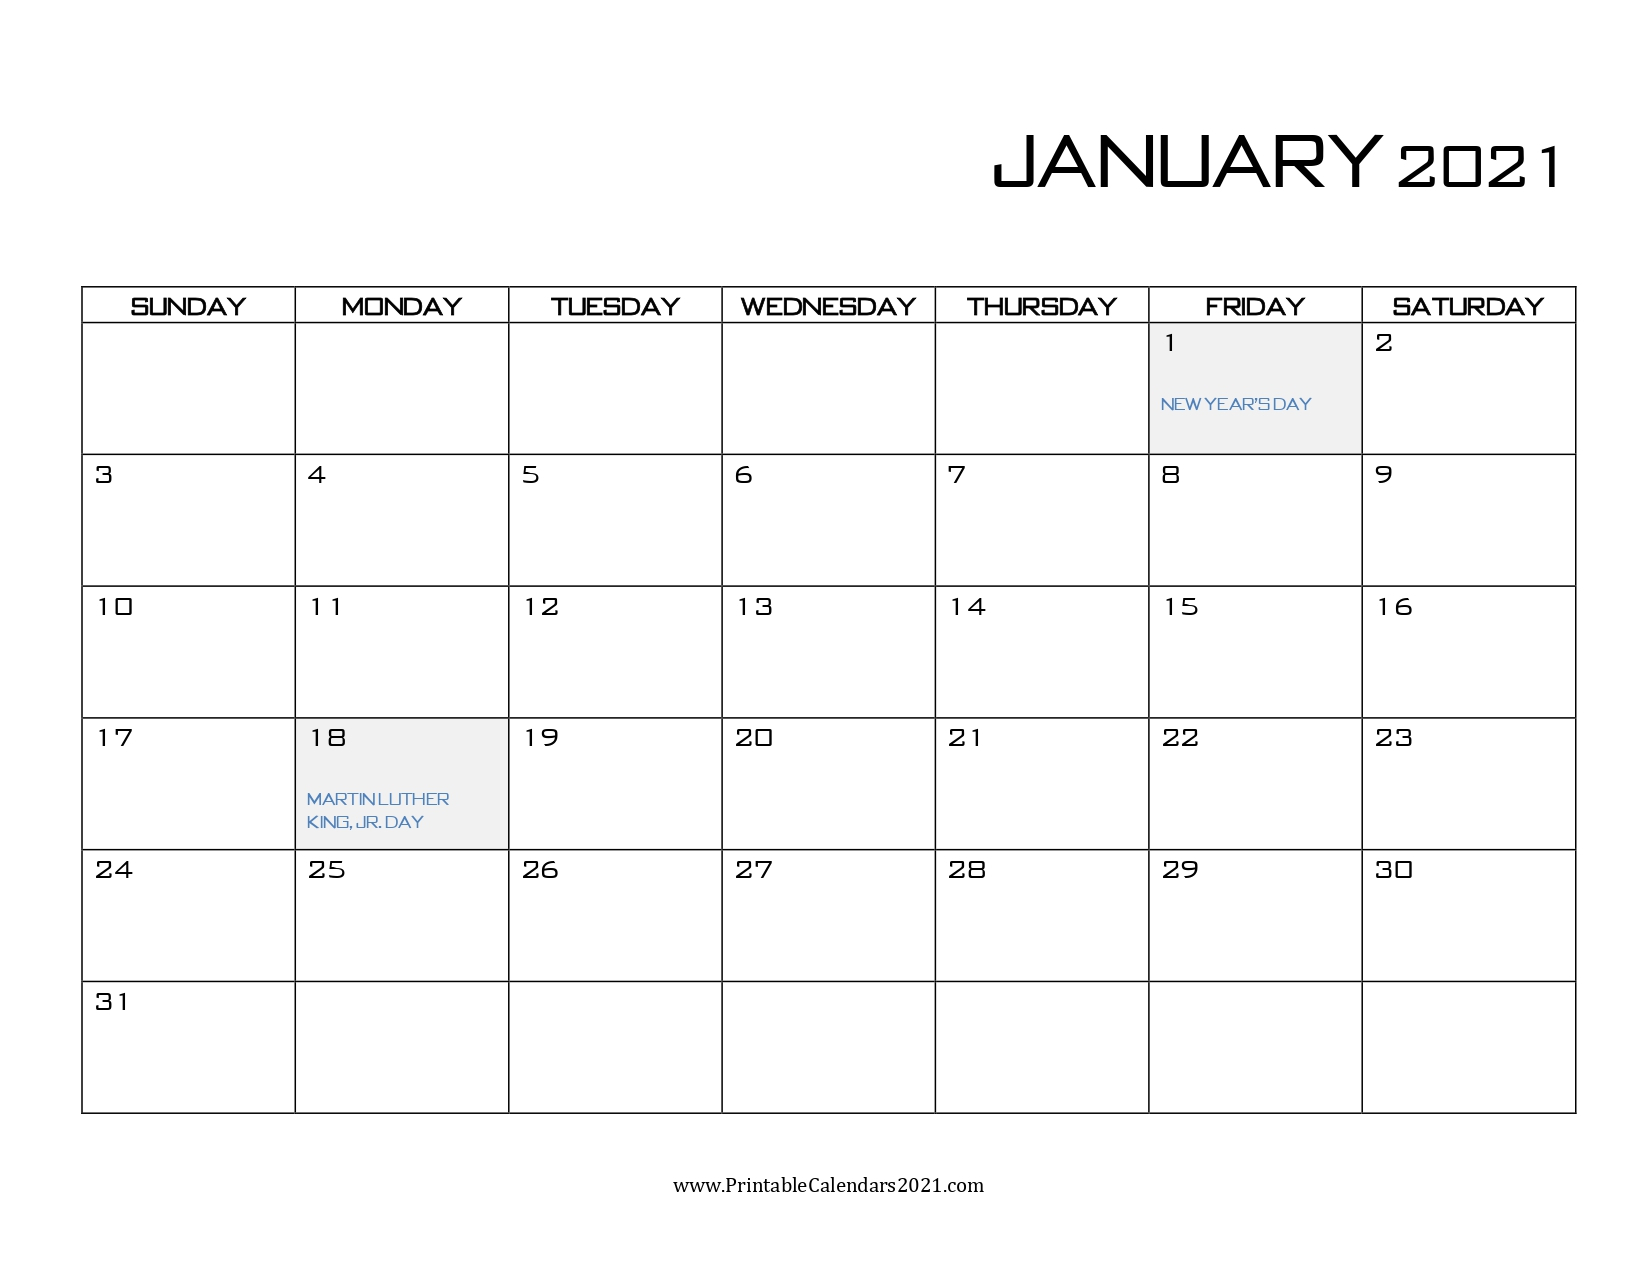 65 Printable Calendar January 2021 Holidays Portrait 2